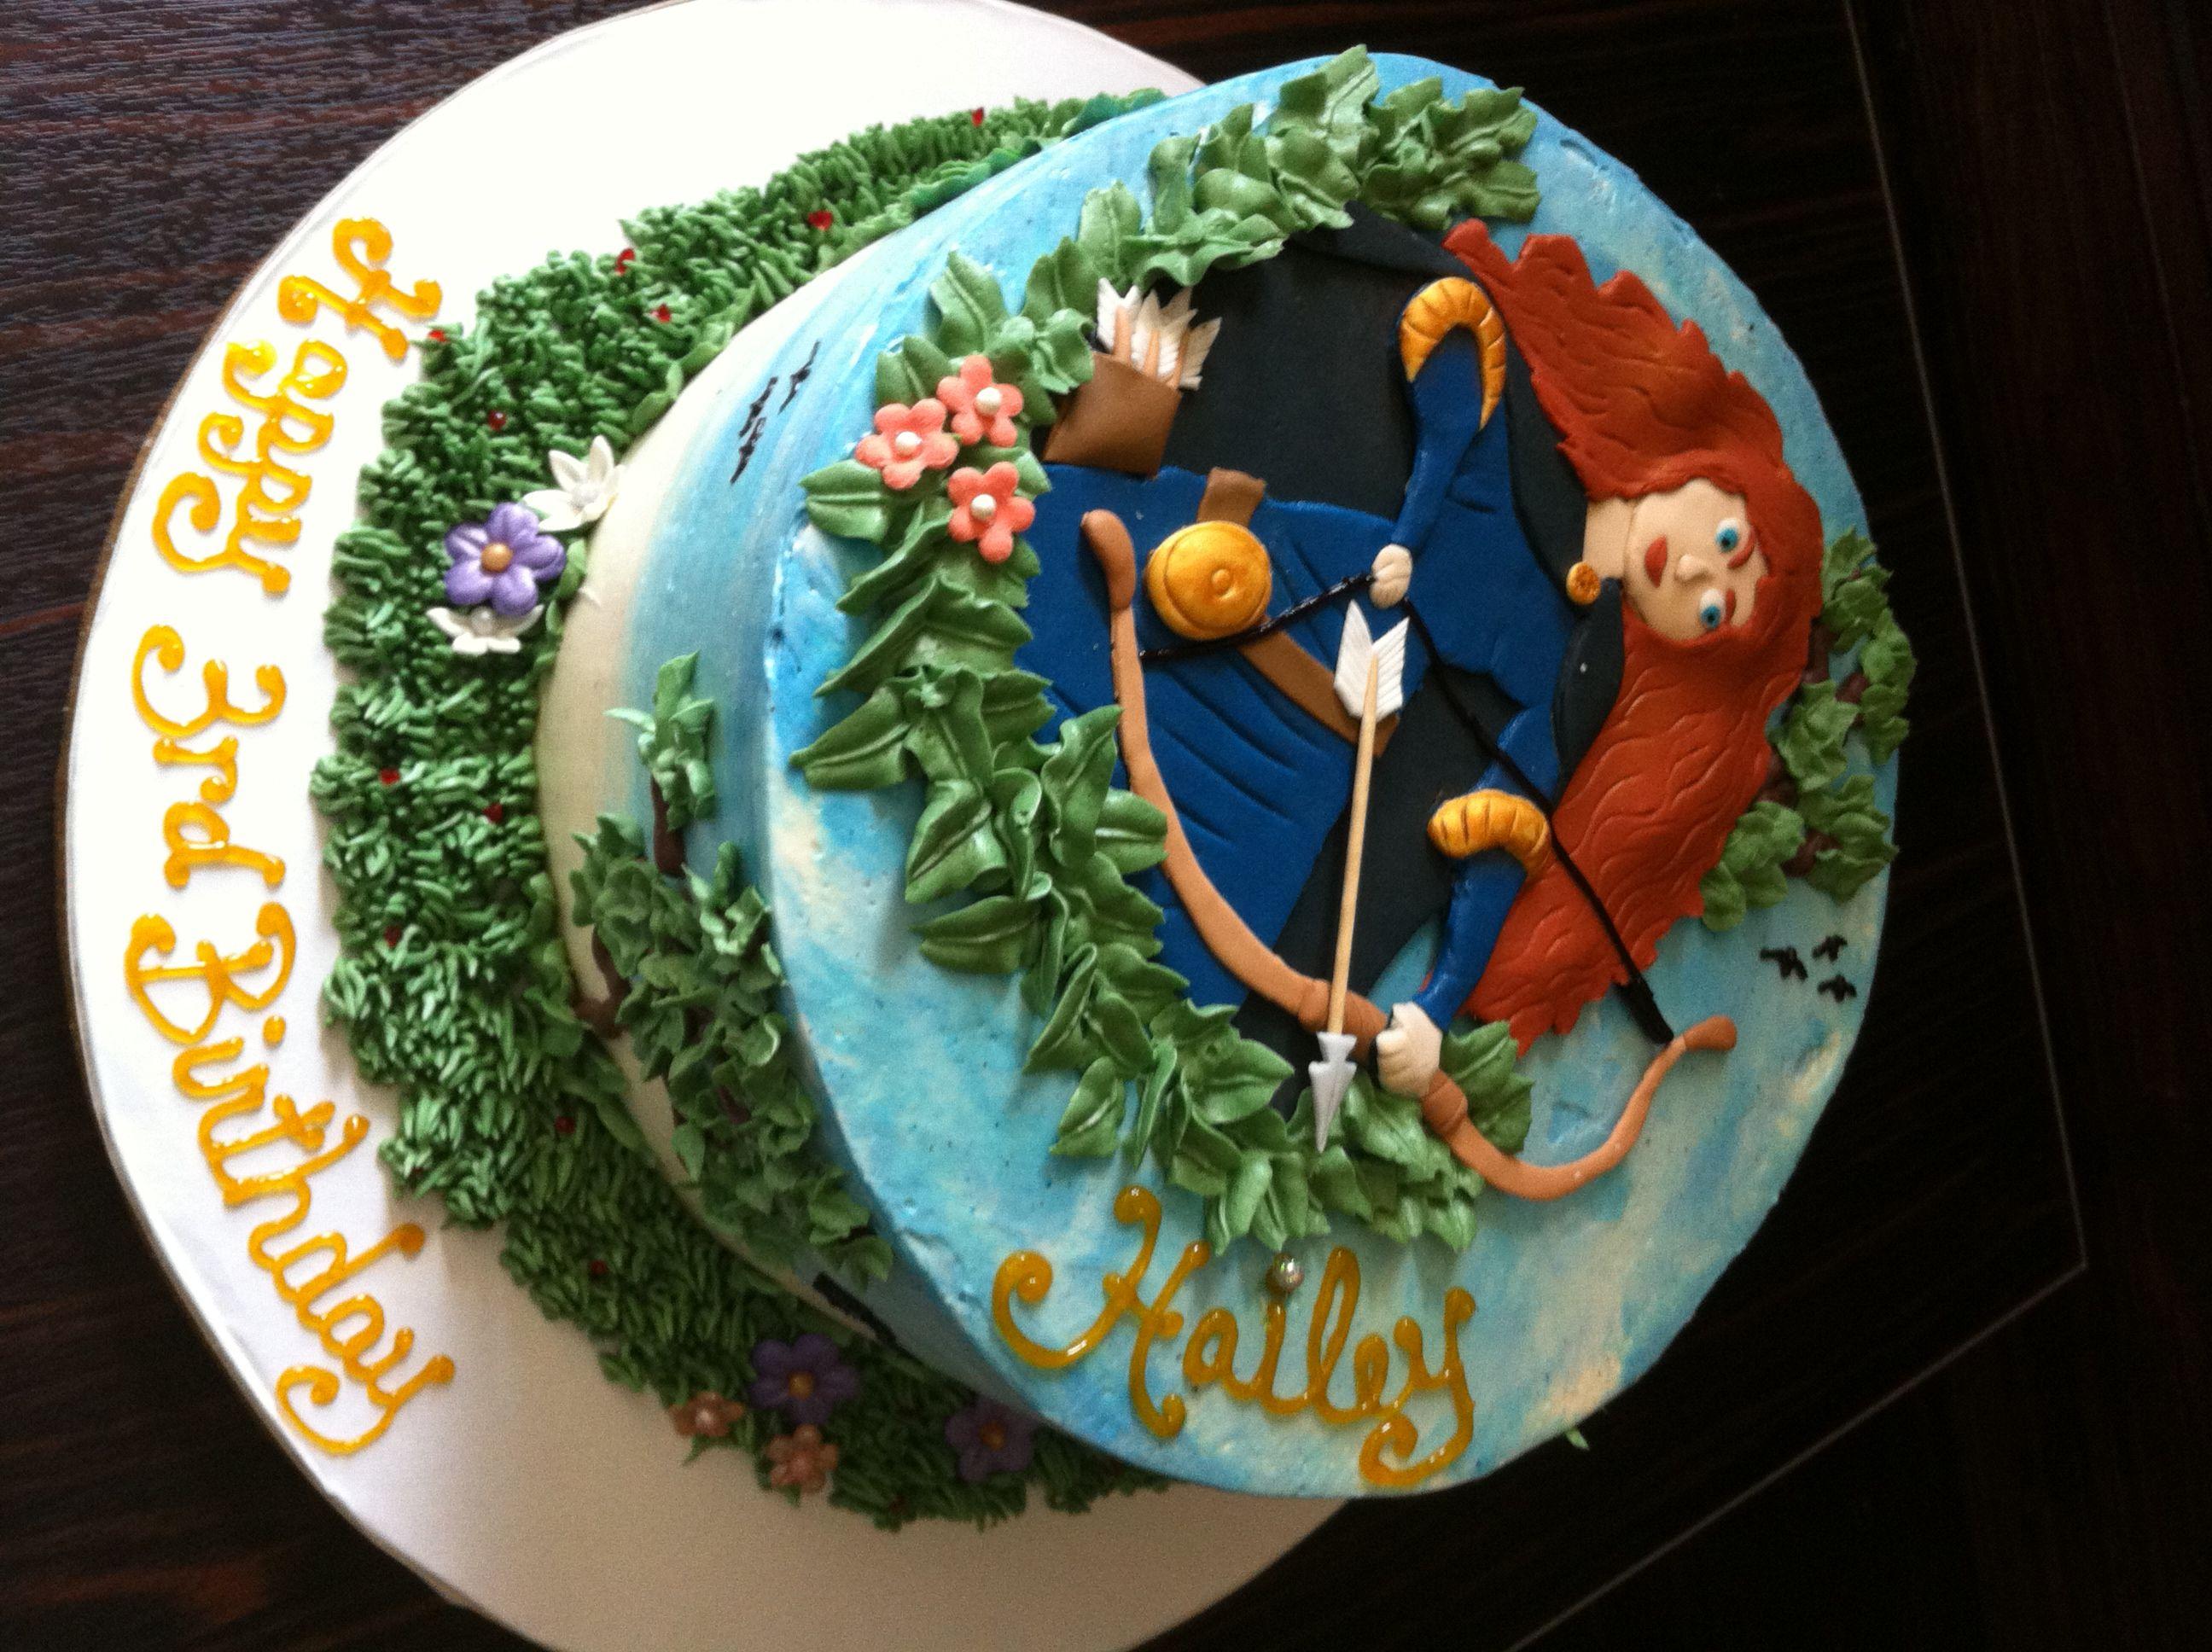 Dessert menu archery girl cake alternate viewpoint